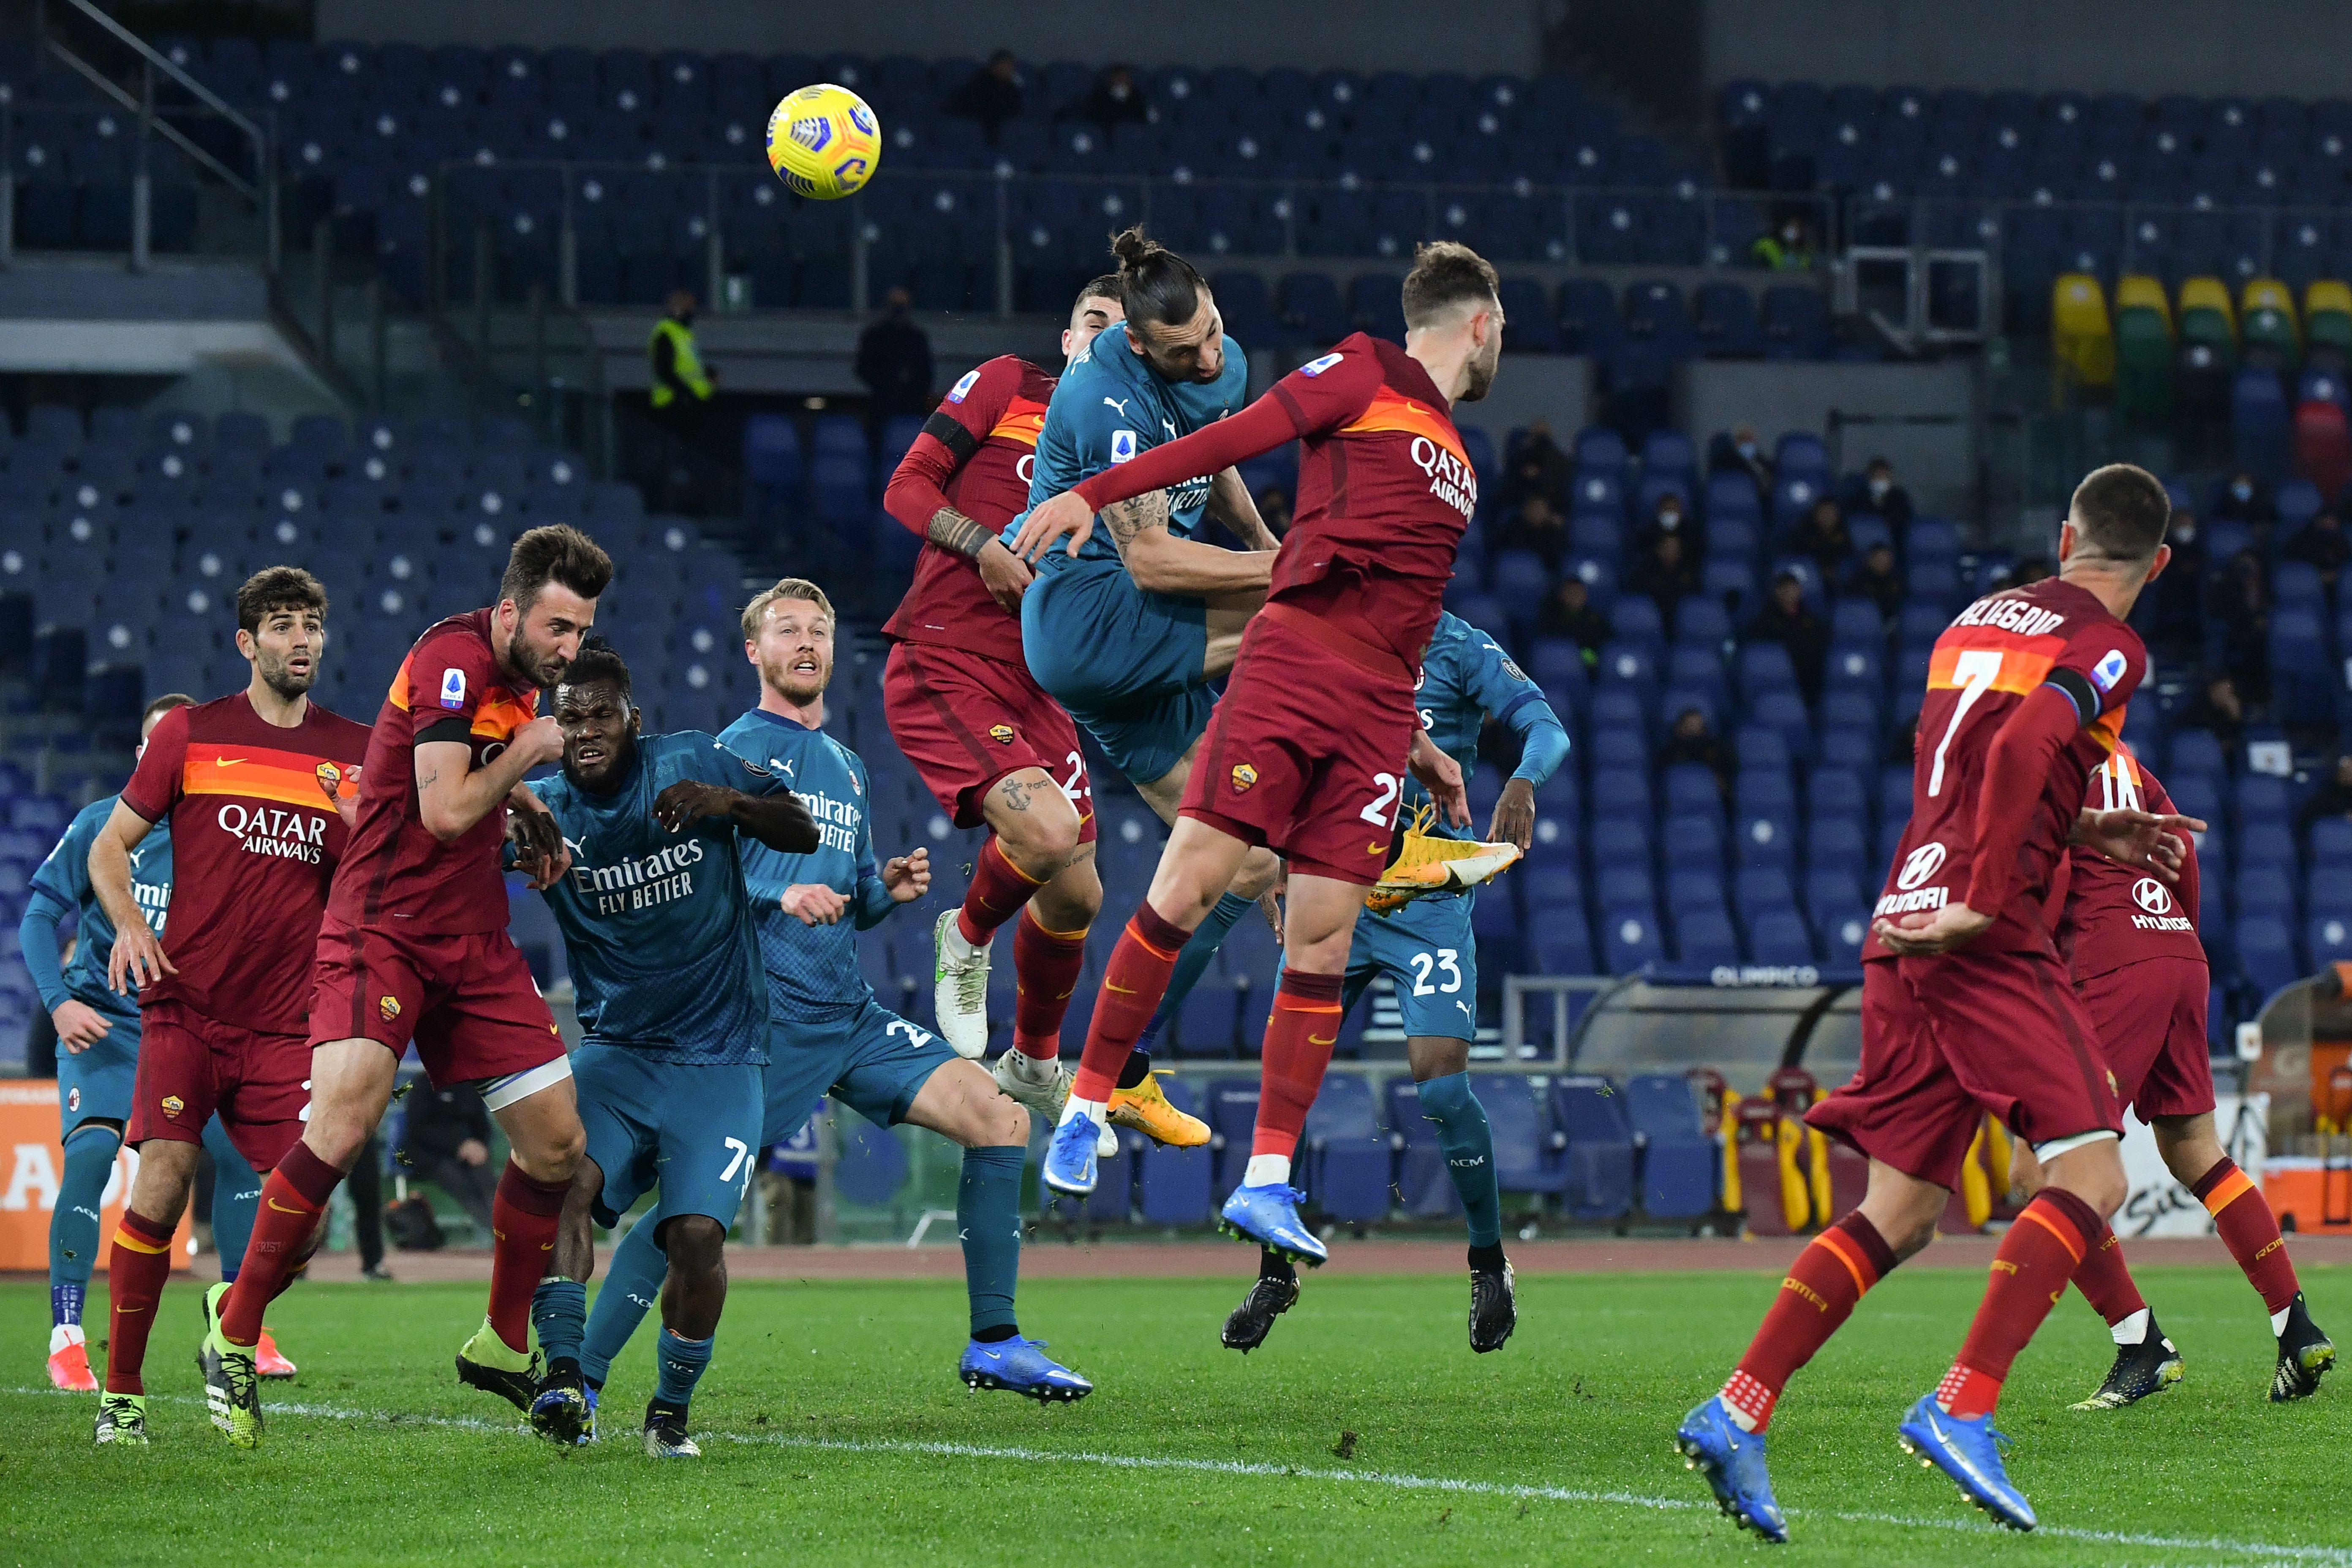 AC米兰在客场2:1战胜罗马